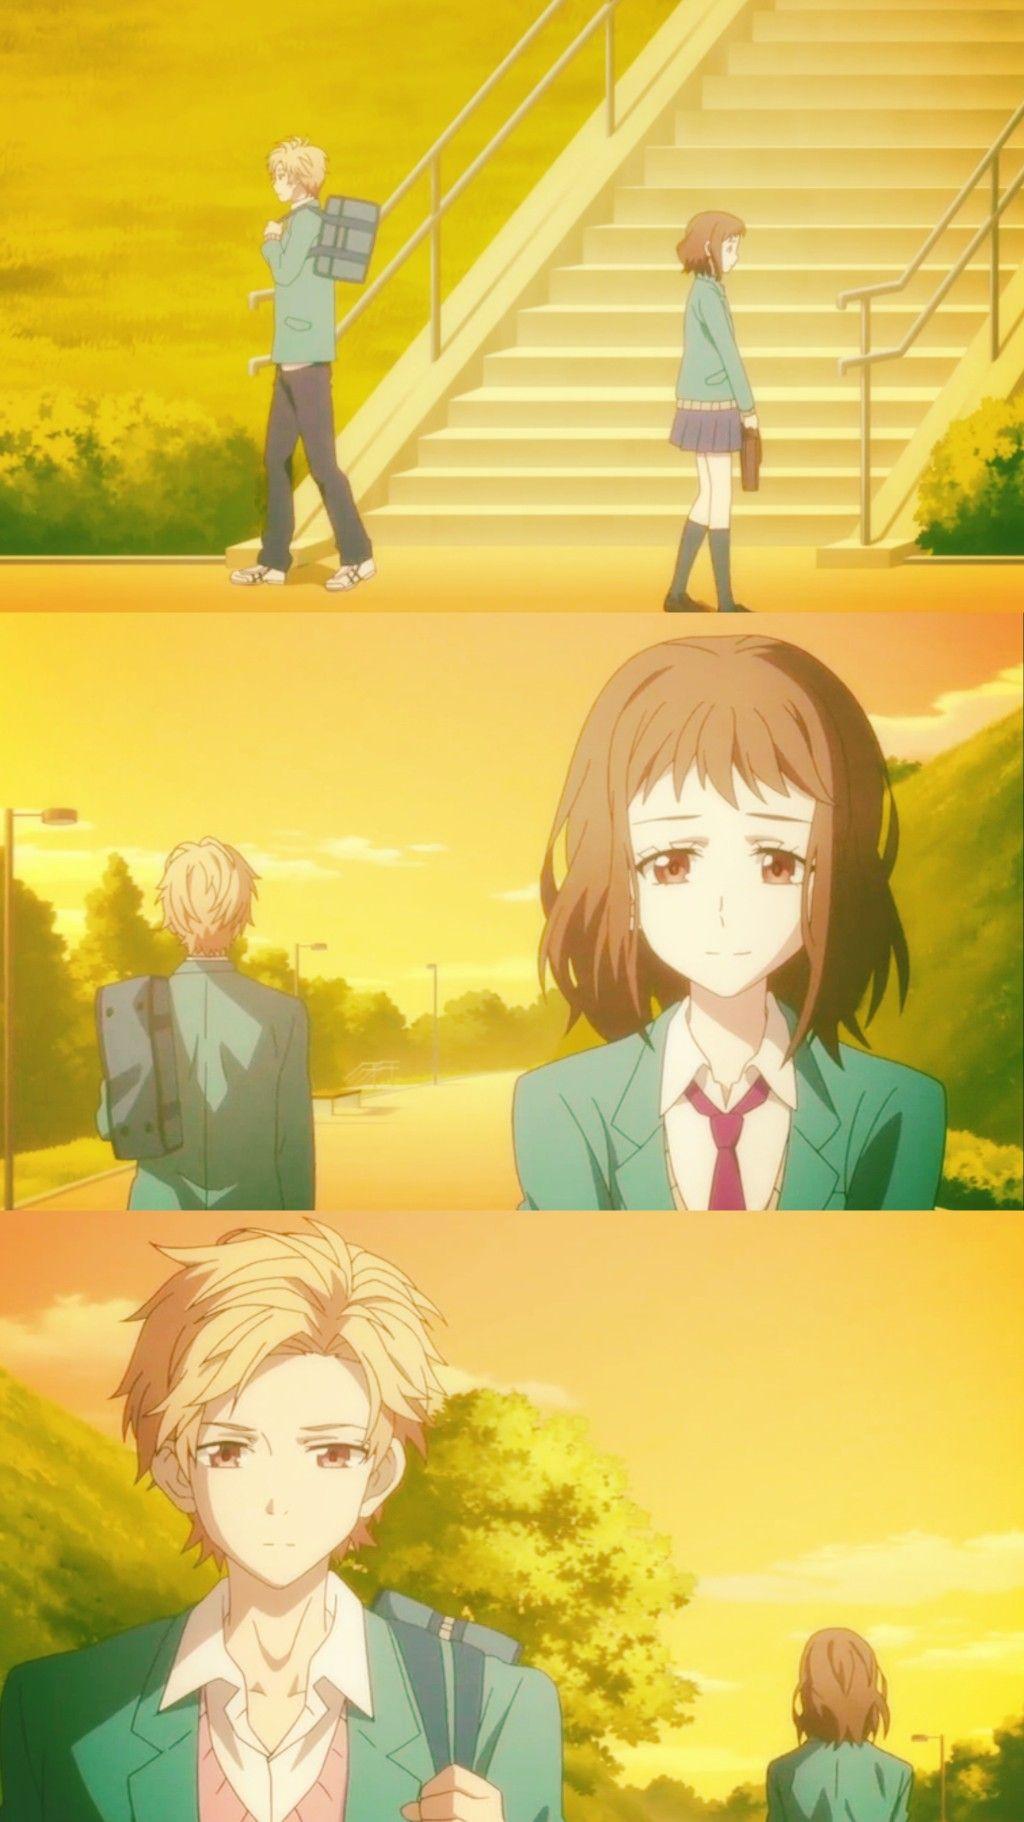 Haruki X Miou Our Love Has Always Been 10 Cm Apart Romantic Anime Best Romance Anime Anime Romance